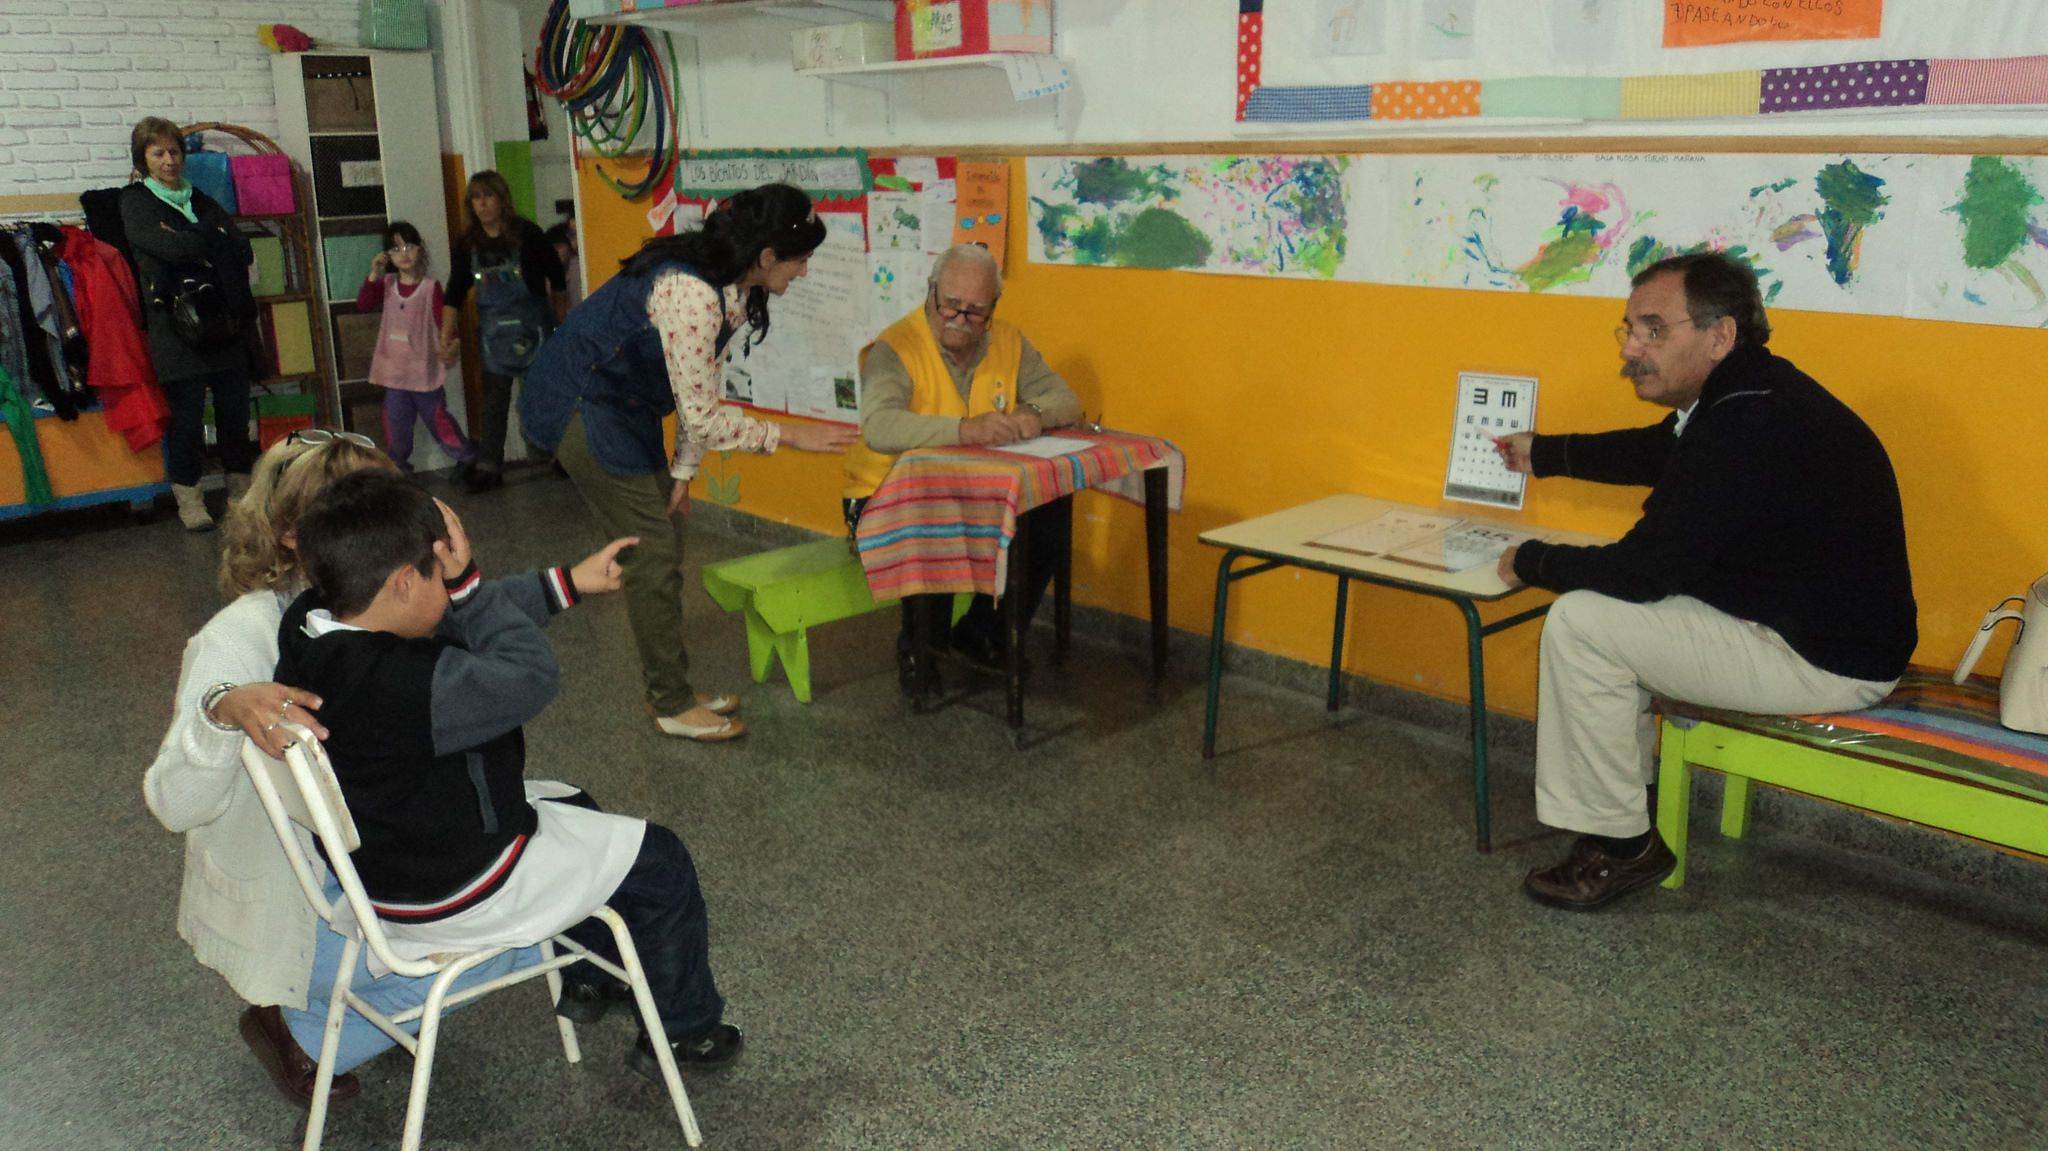 Punta Alta #LionsClub (Argentina) provided vision screening for preschoolers